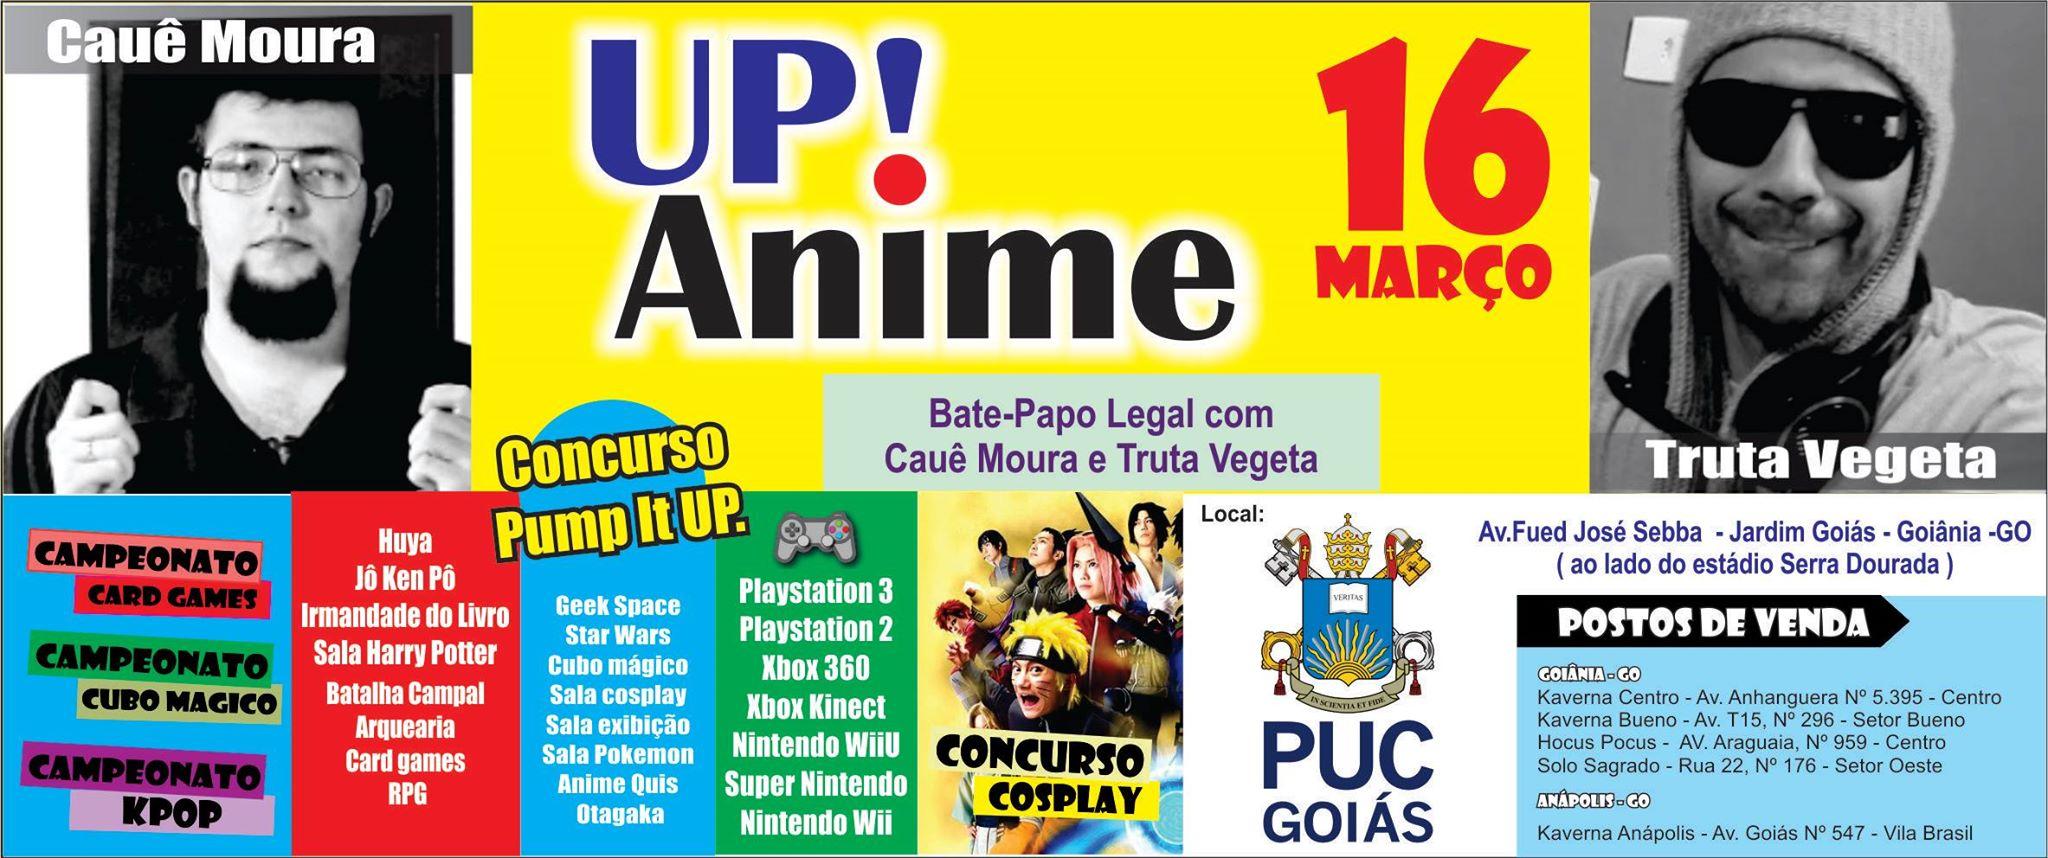 up anime 2014